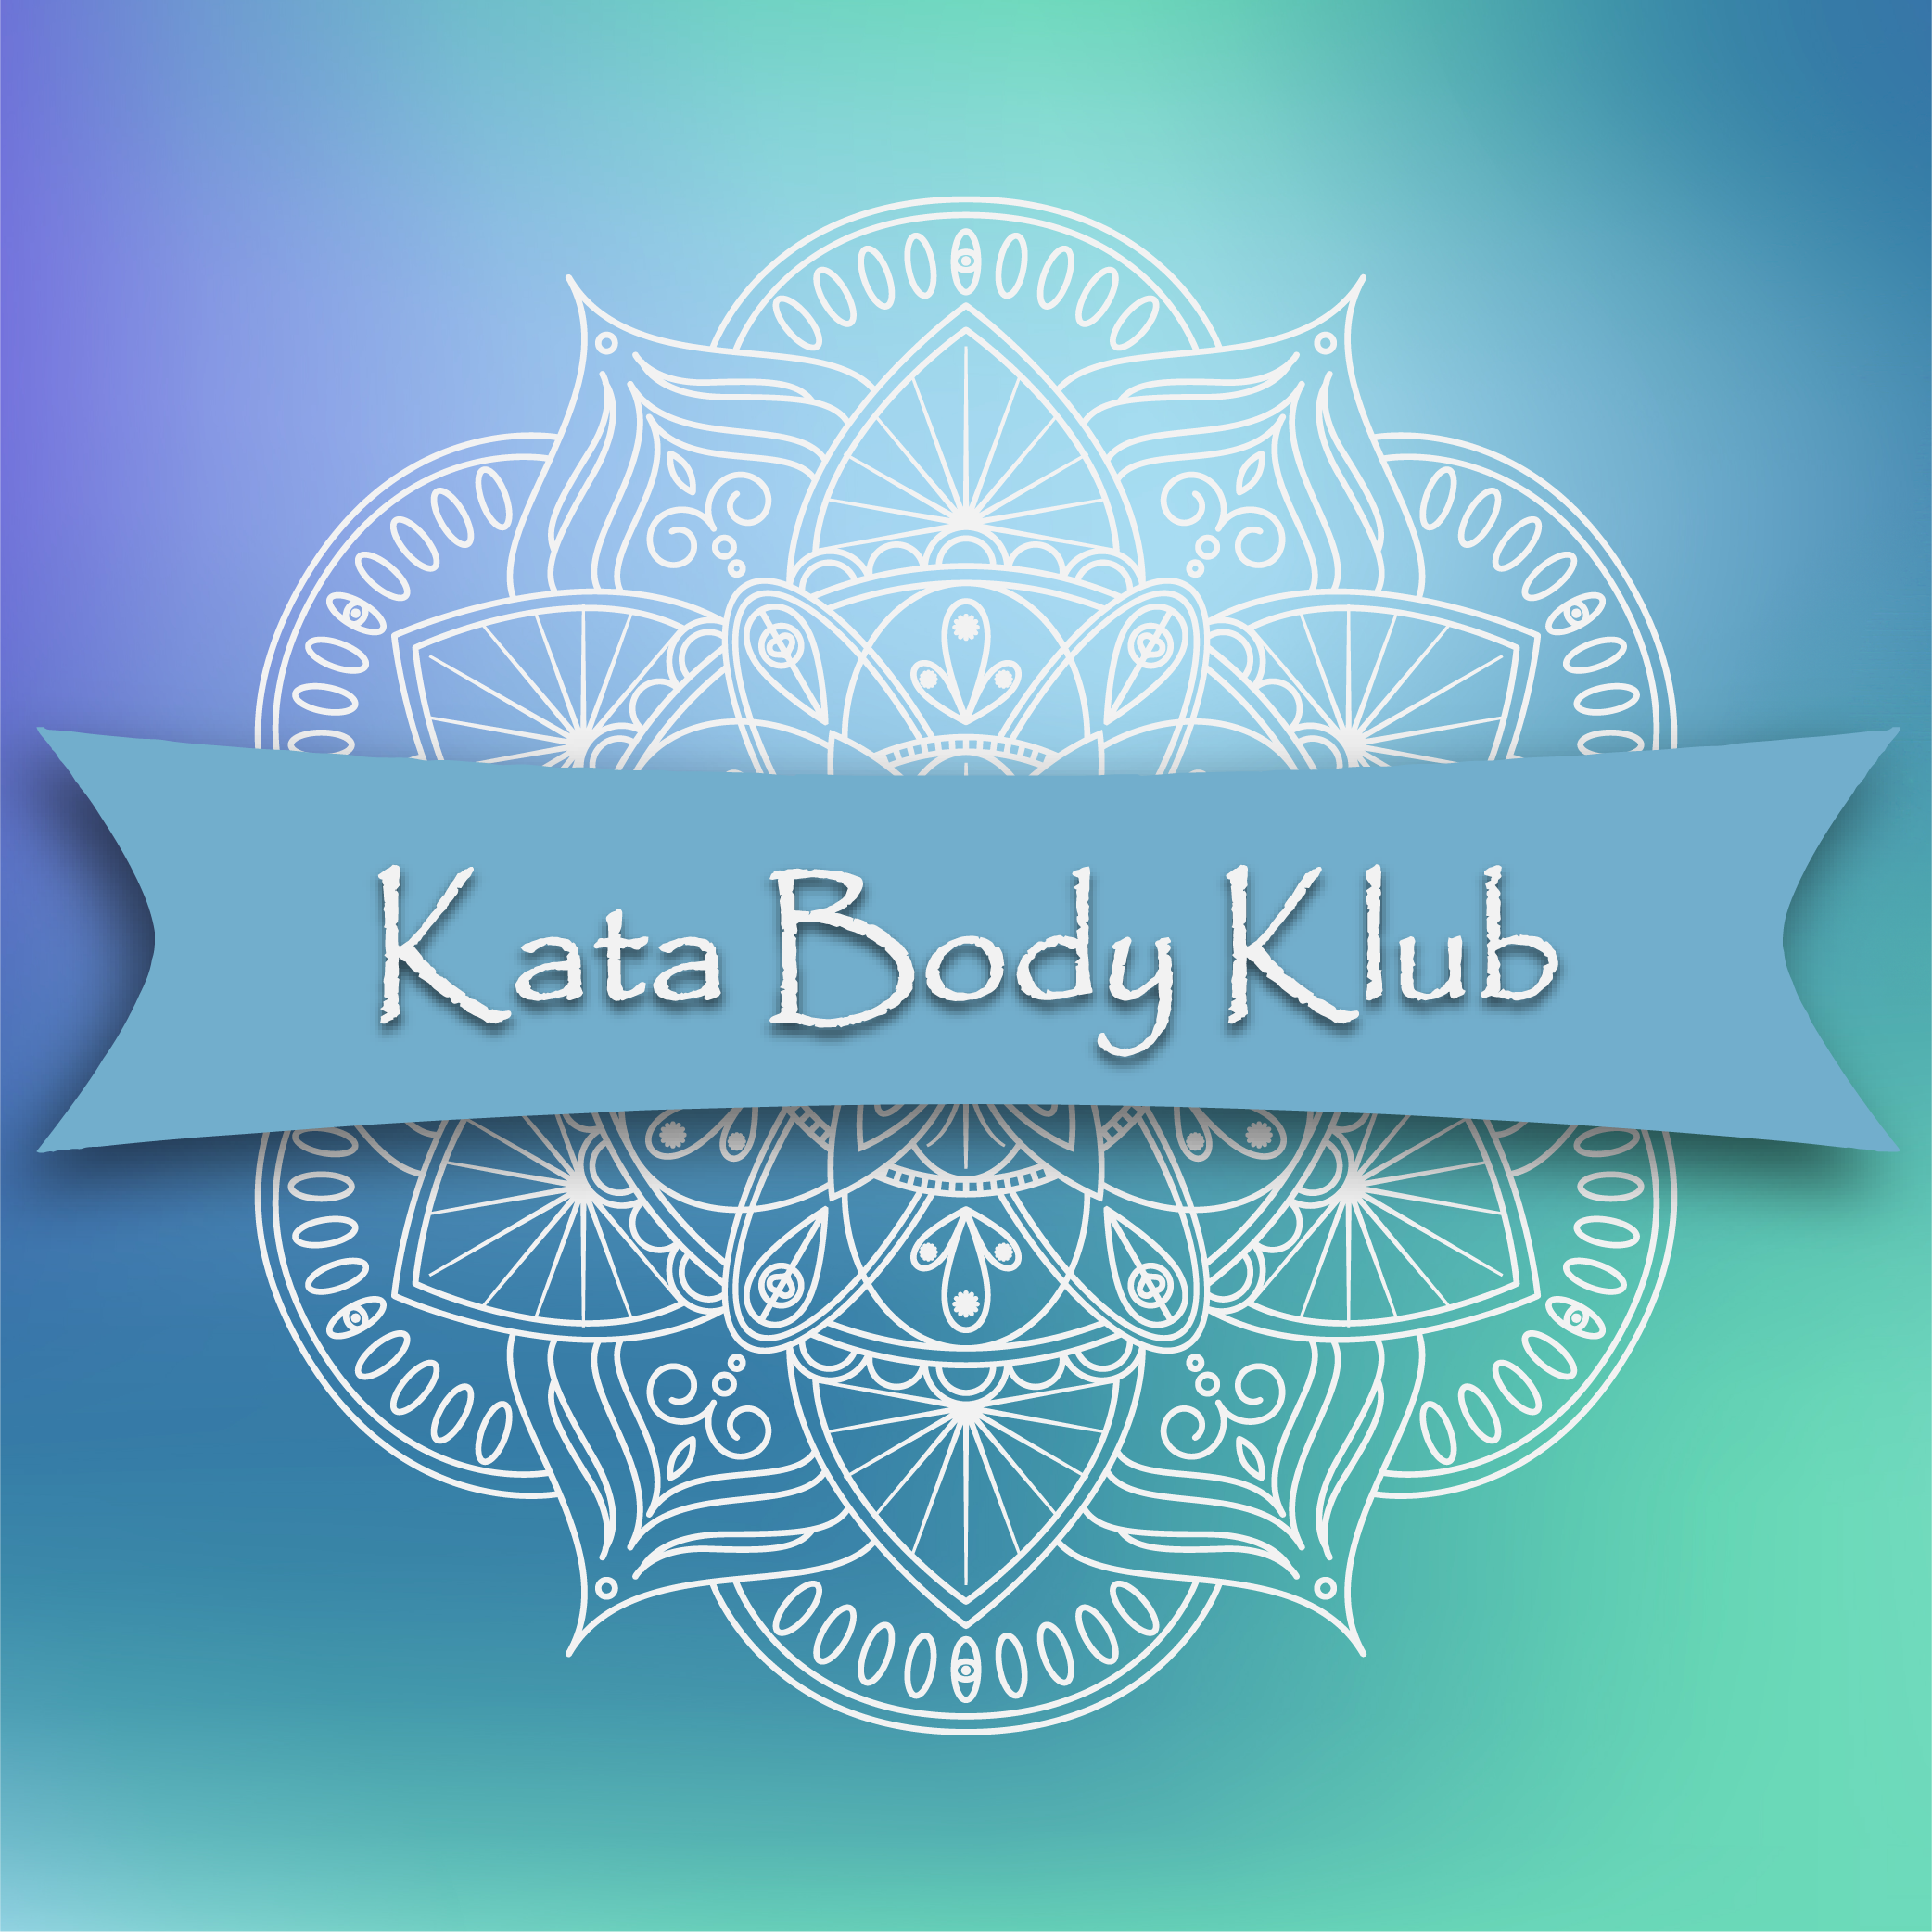 Kata Body Klub